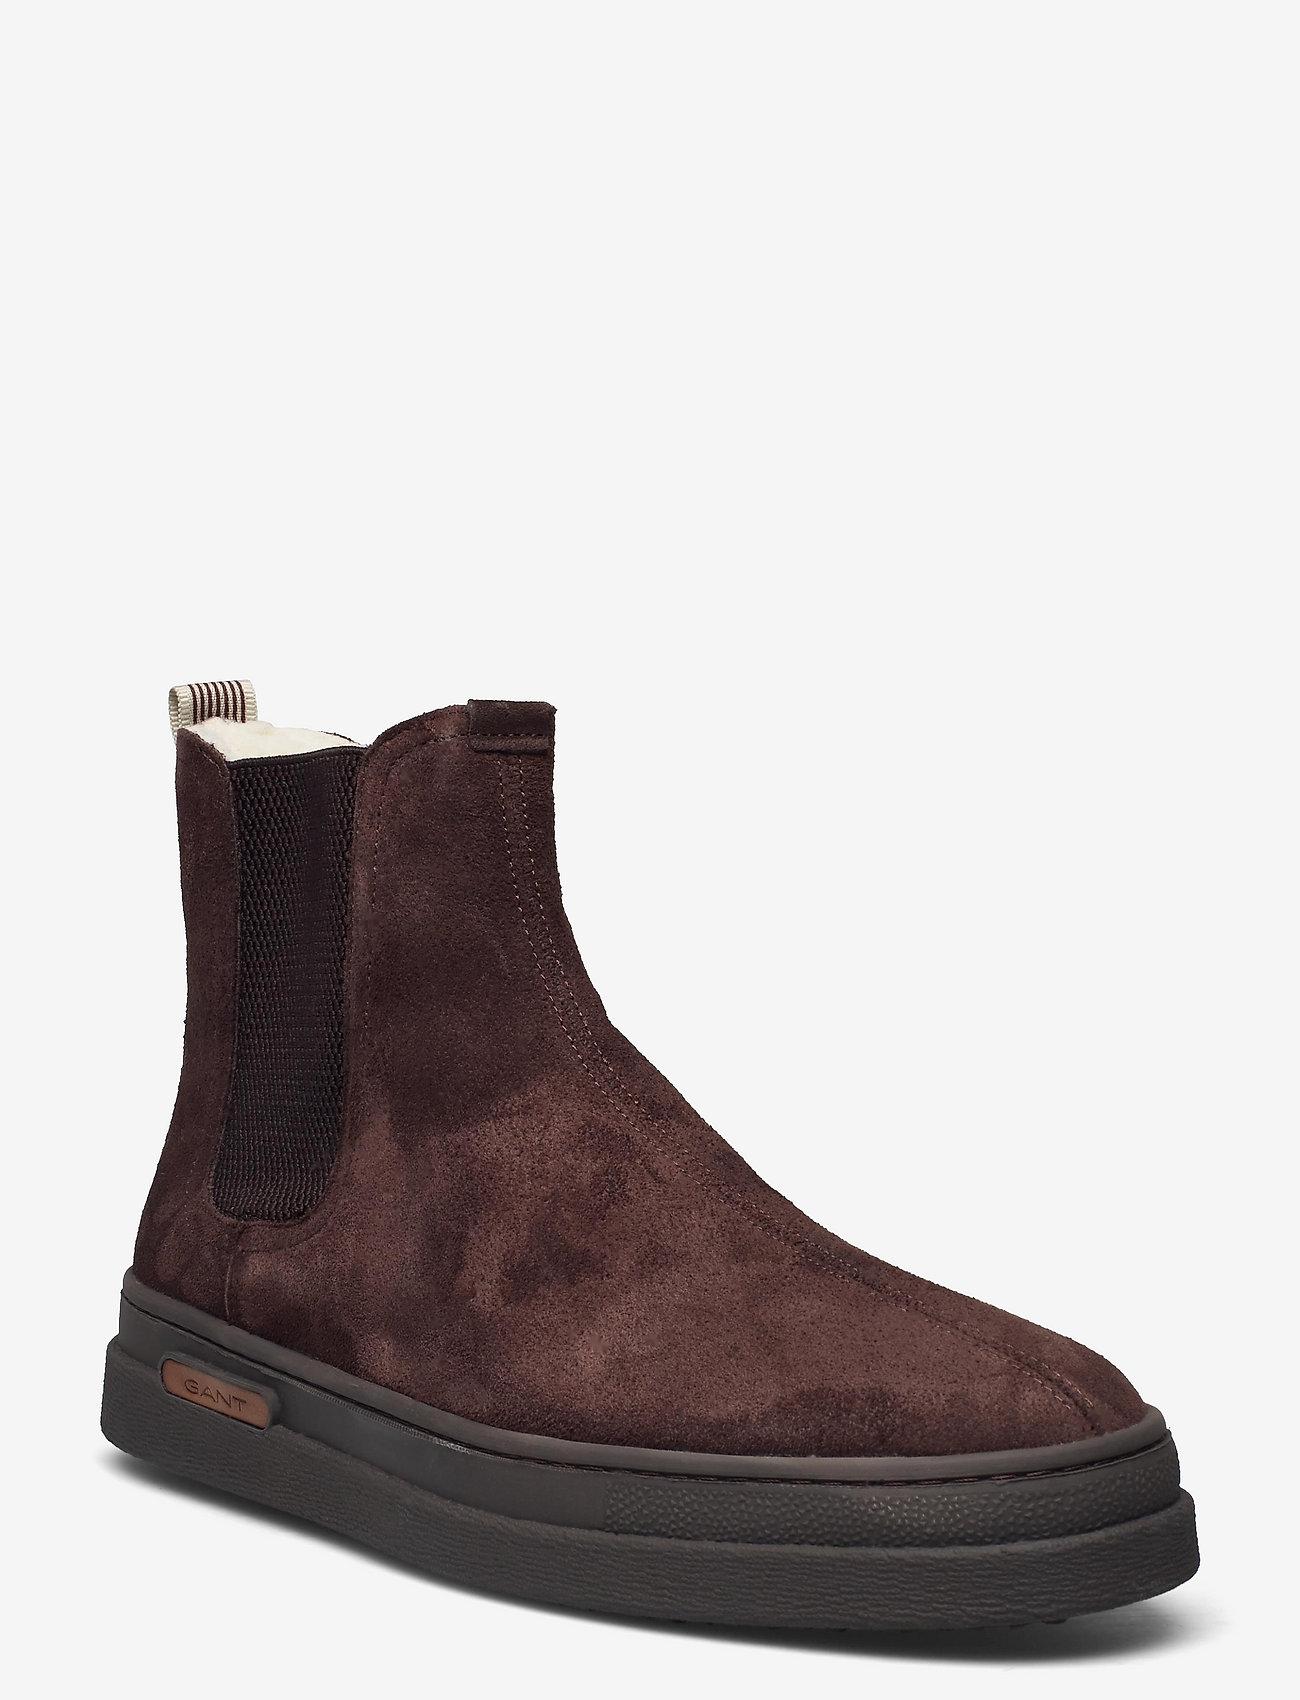 GANT - Cloyd Chelsea - chelsea boots - dark brown - 0